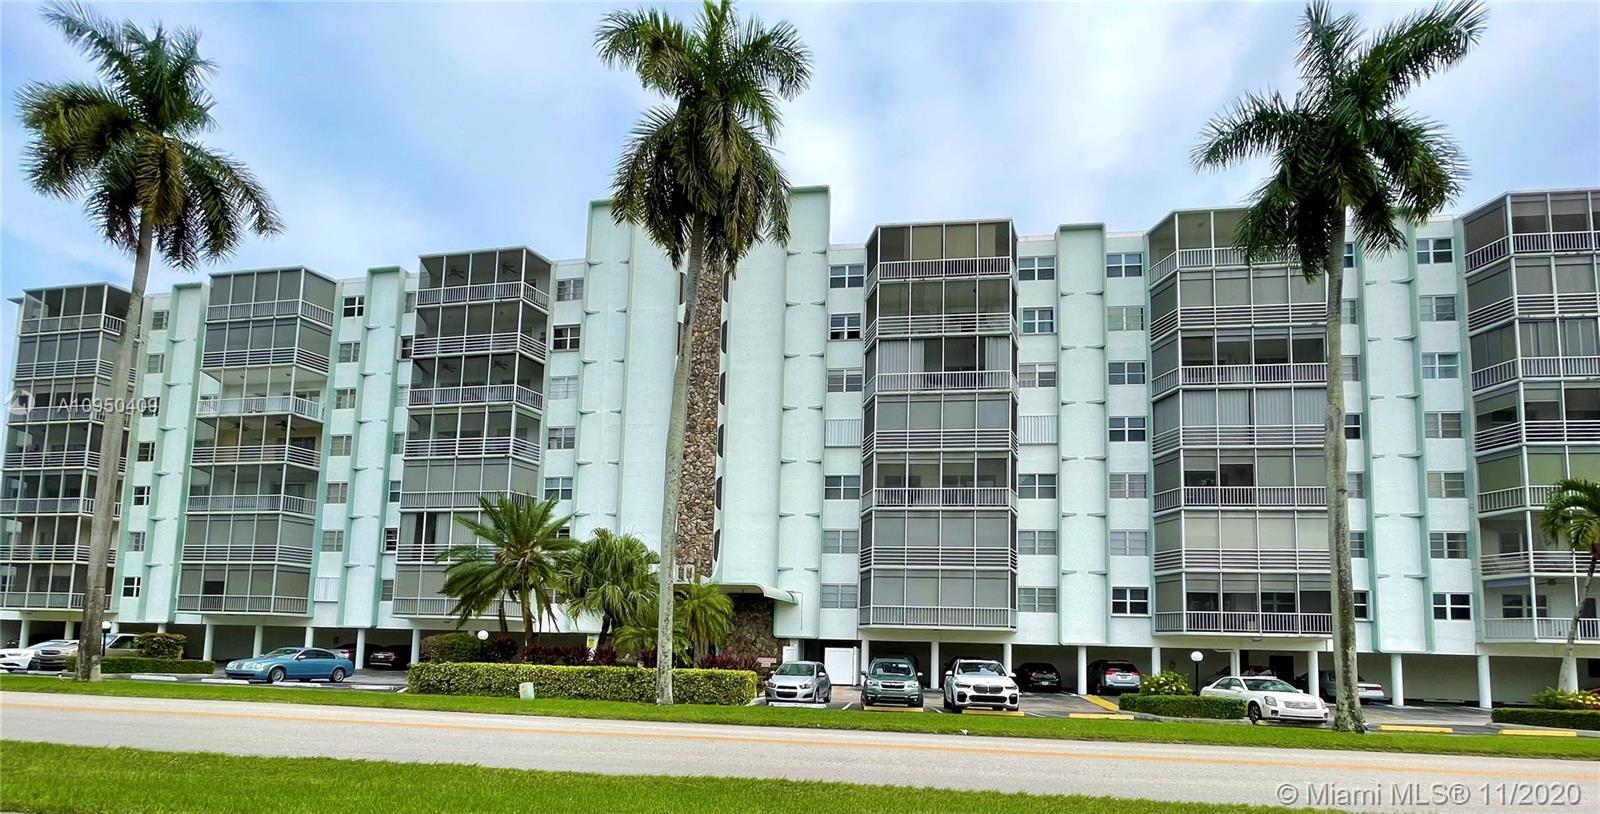 Fairways Riviera #608 - 400 Diplomat #608, Hallandale Beach, FL 33009